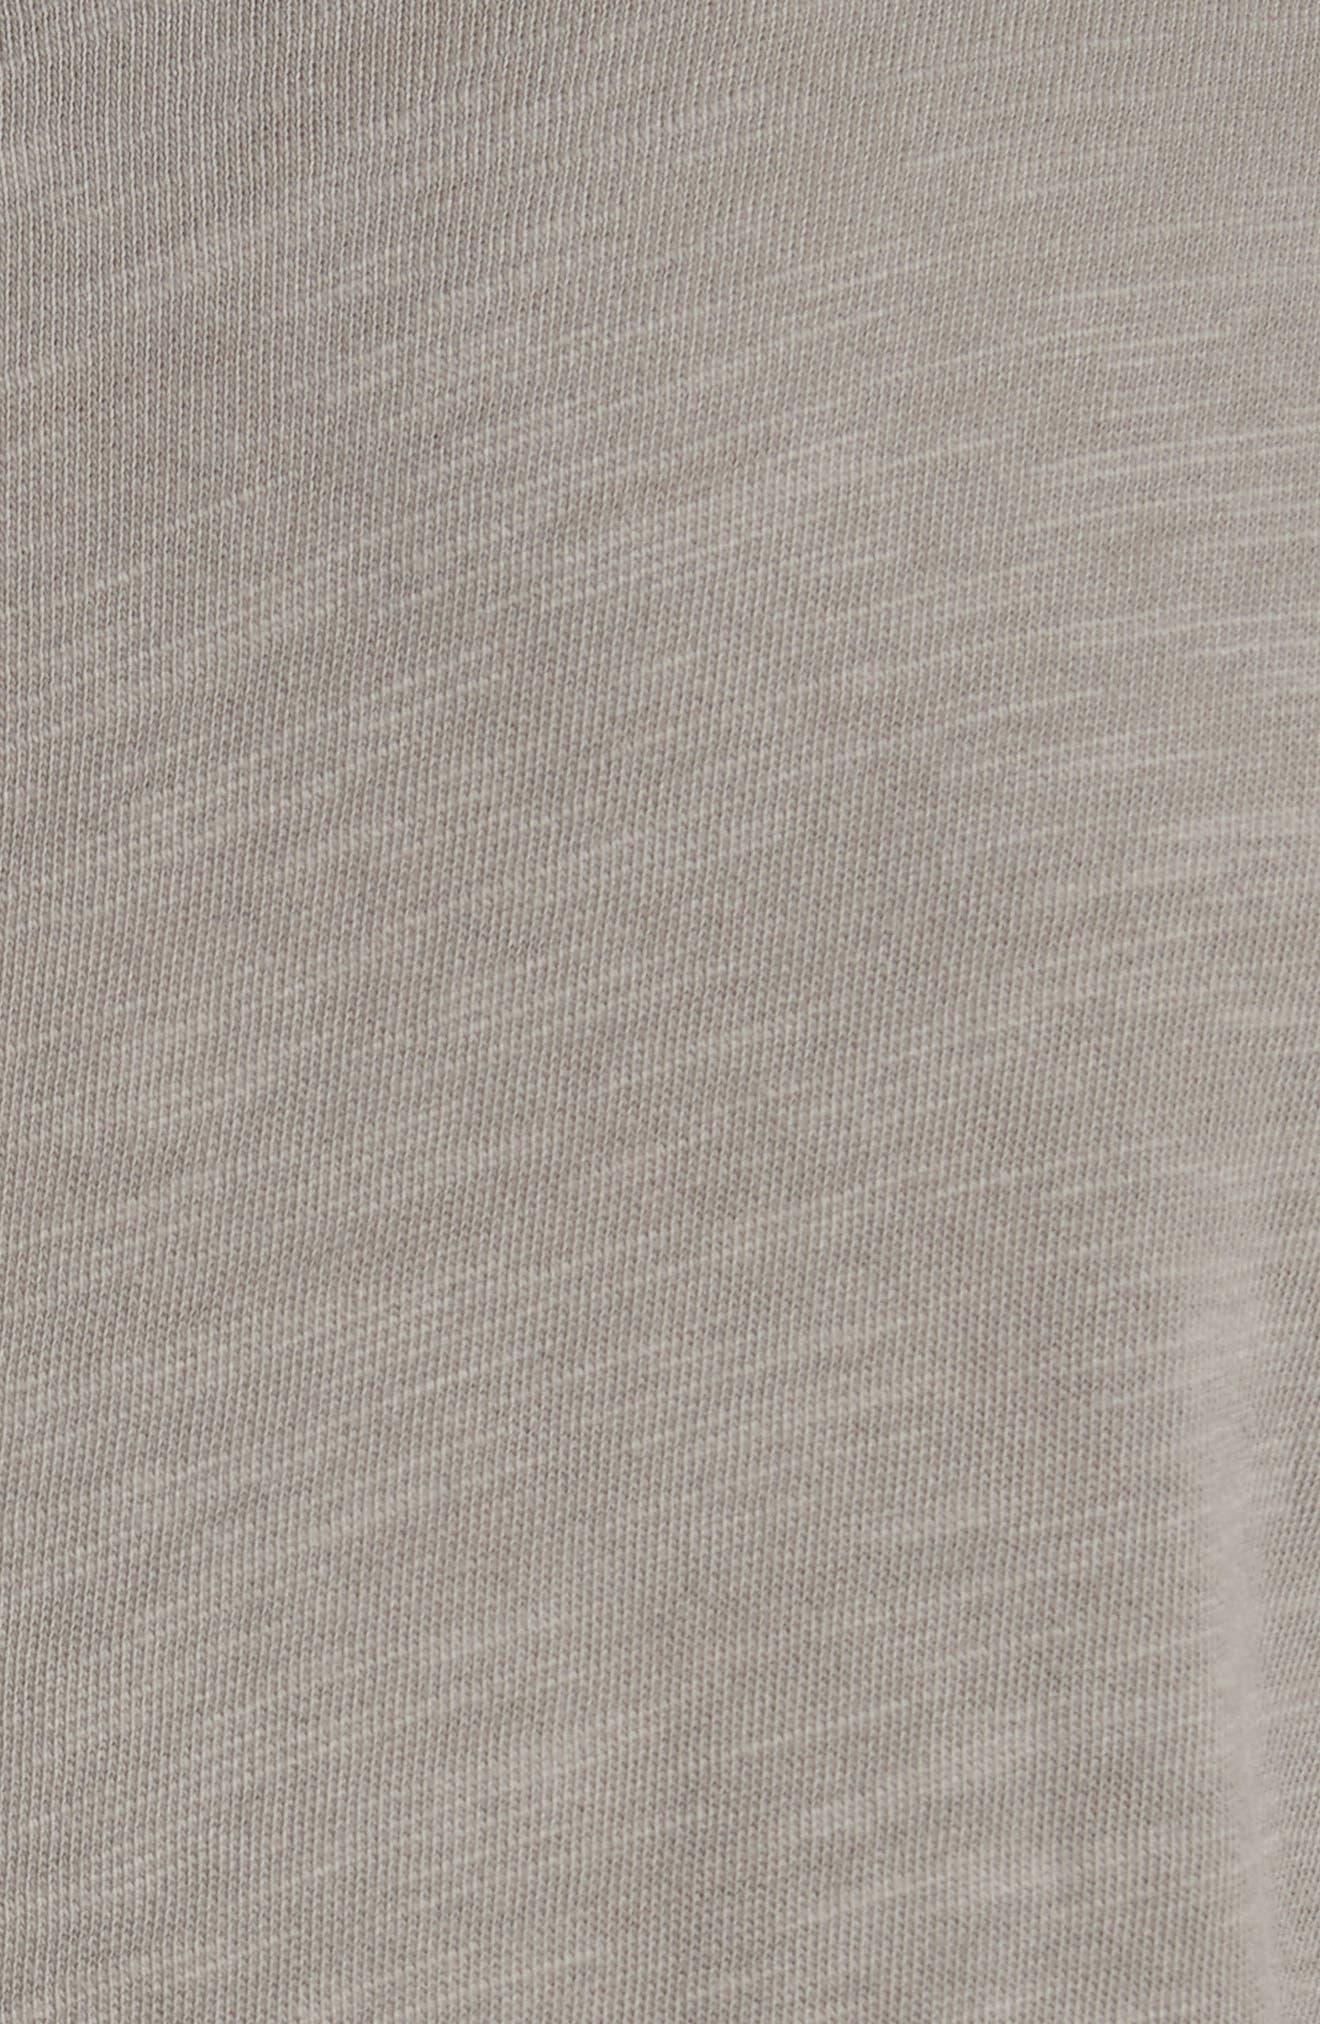 Standard Issue Slubbed Cotton T-Shirt,                             Alternate thumbnail 5, color,                             010